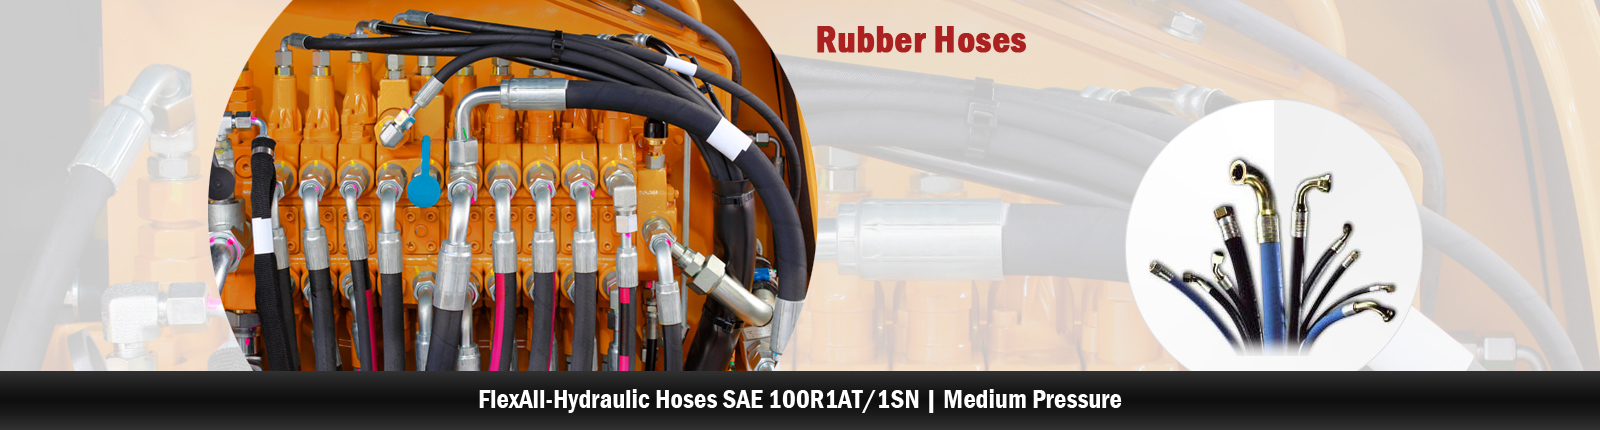 rubber-hose